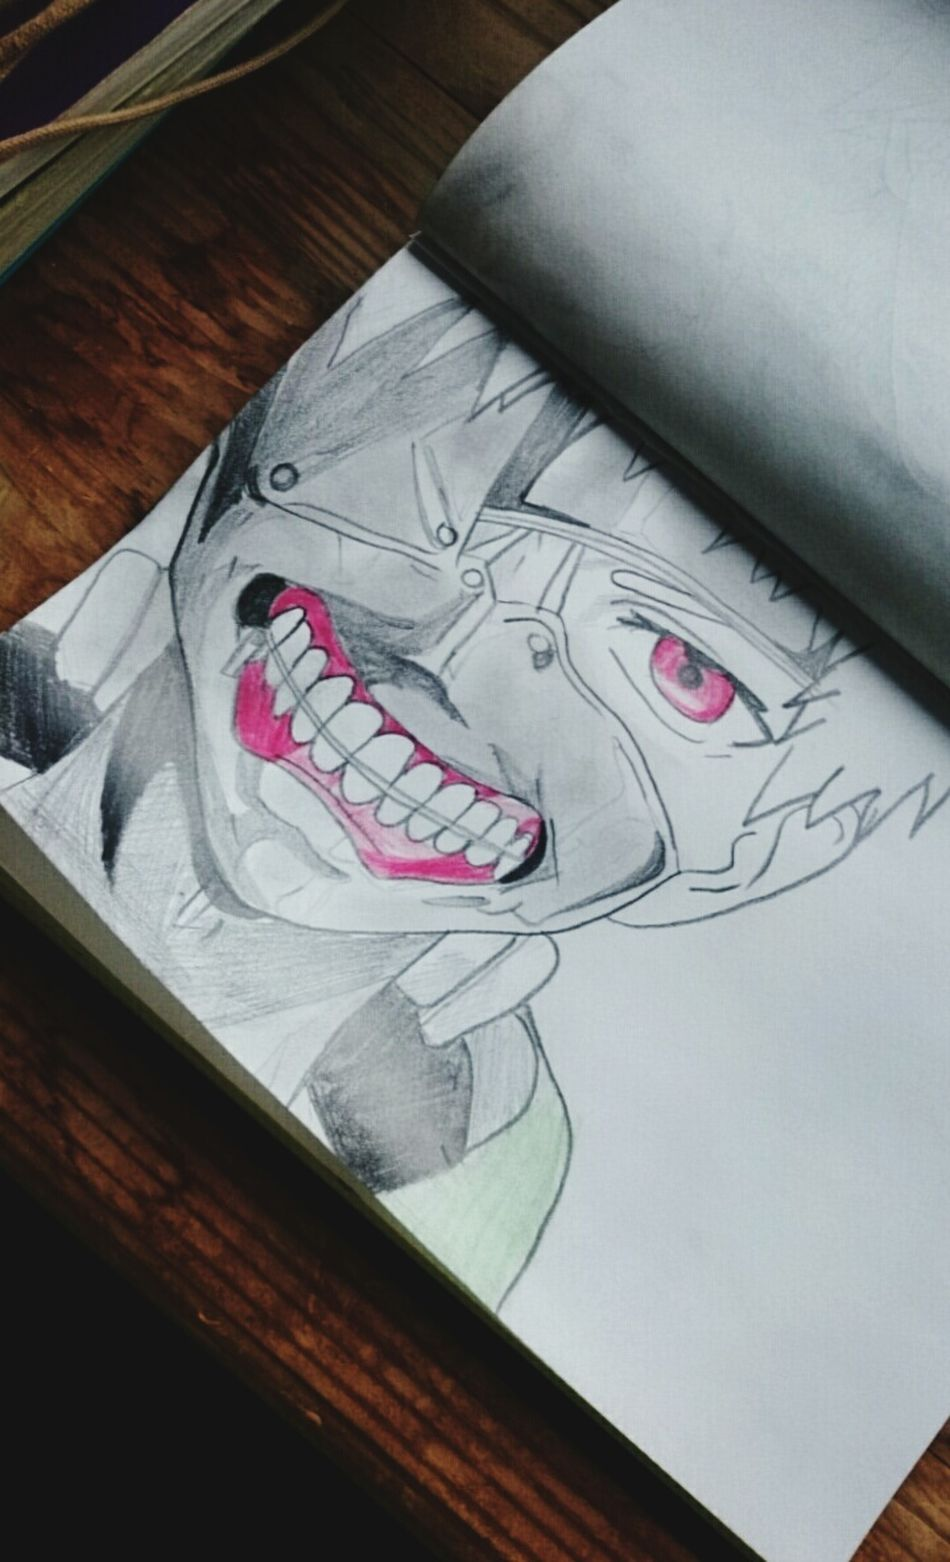 Did a drawing Tokyo Ghoul Kanekiken Drawing Art Shadowing Anime Anime Lover My Favorite Anime